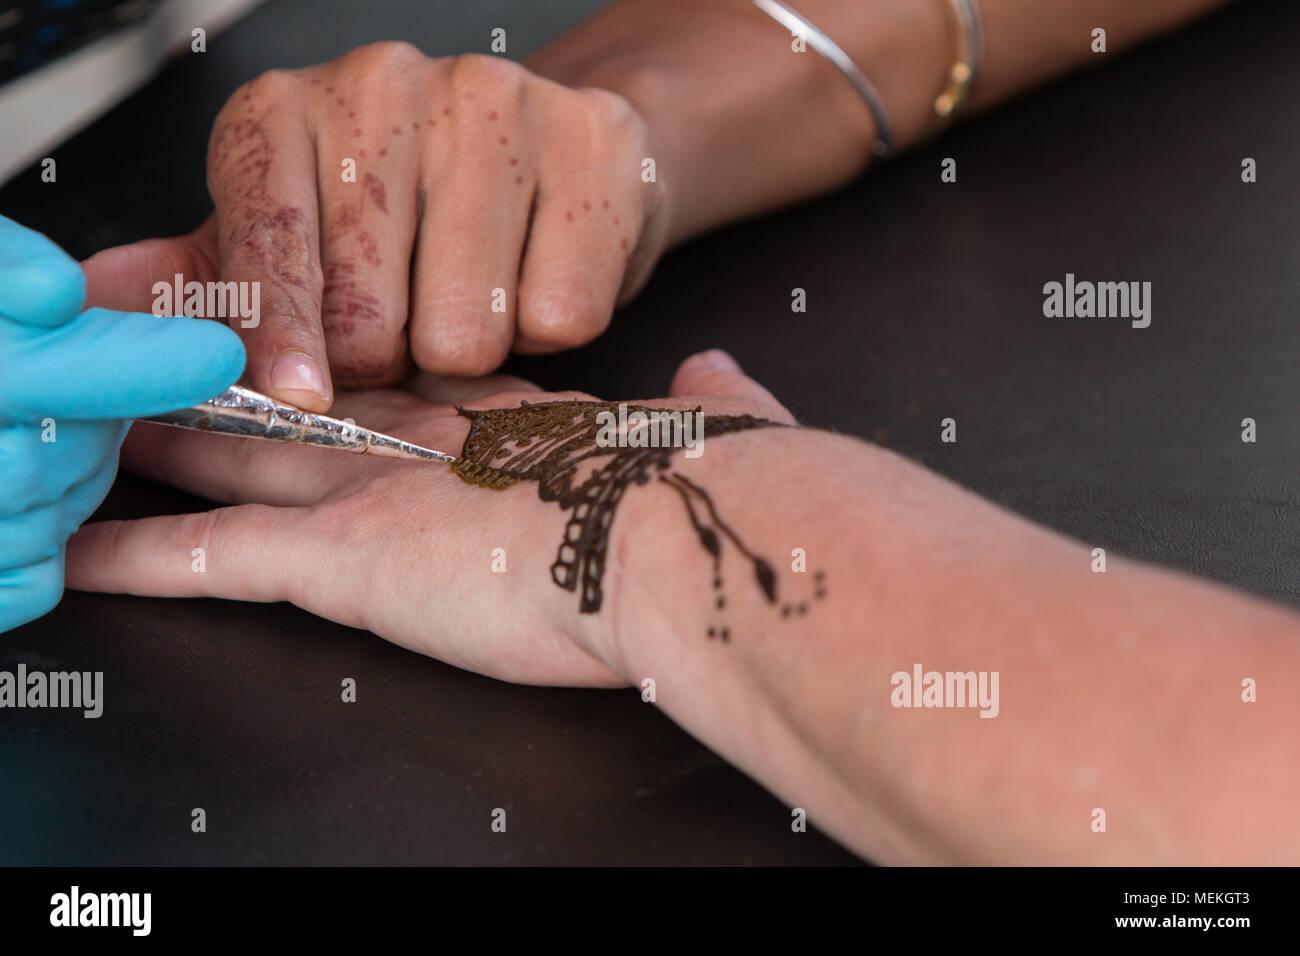 Henna Tattoo Designs Stock Photos Henna Tattoo Designs Stock